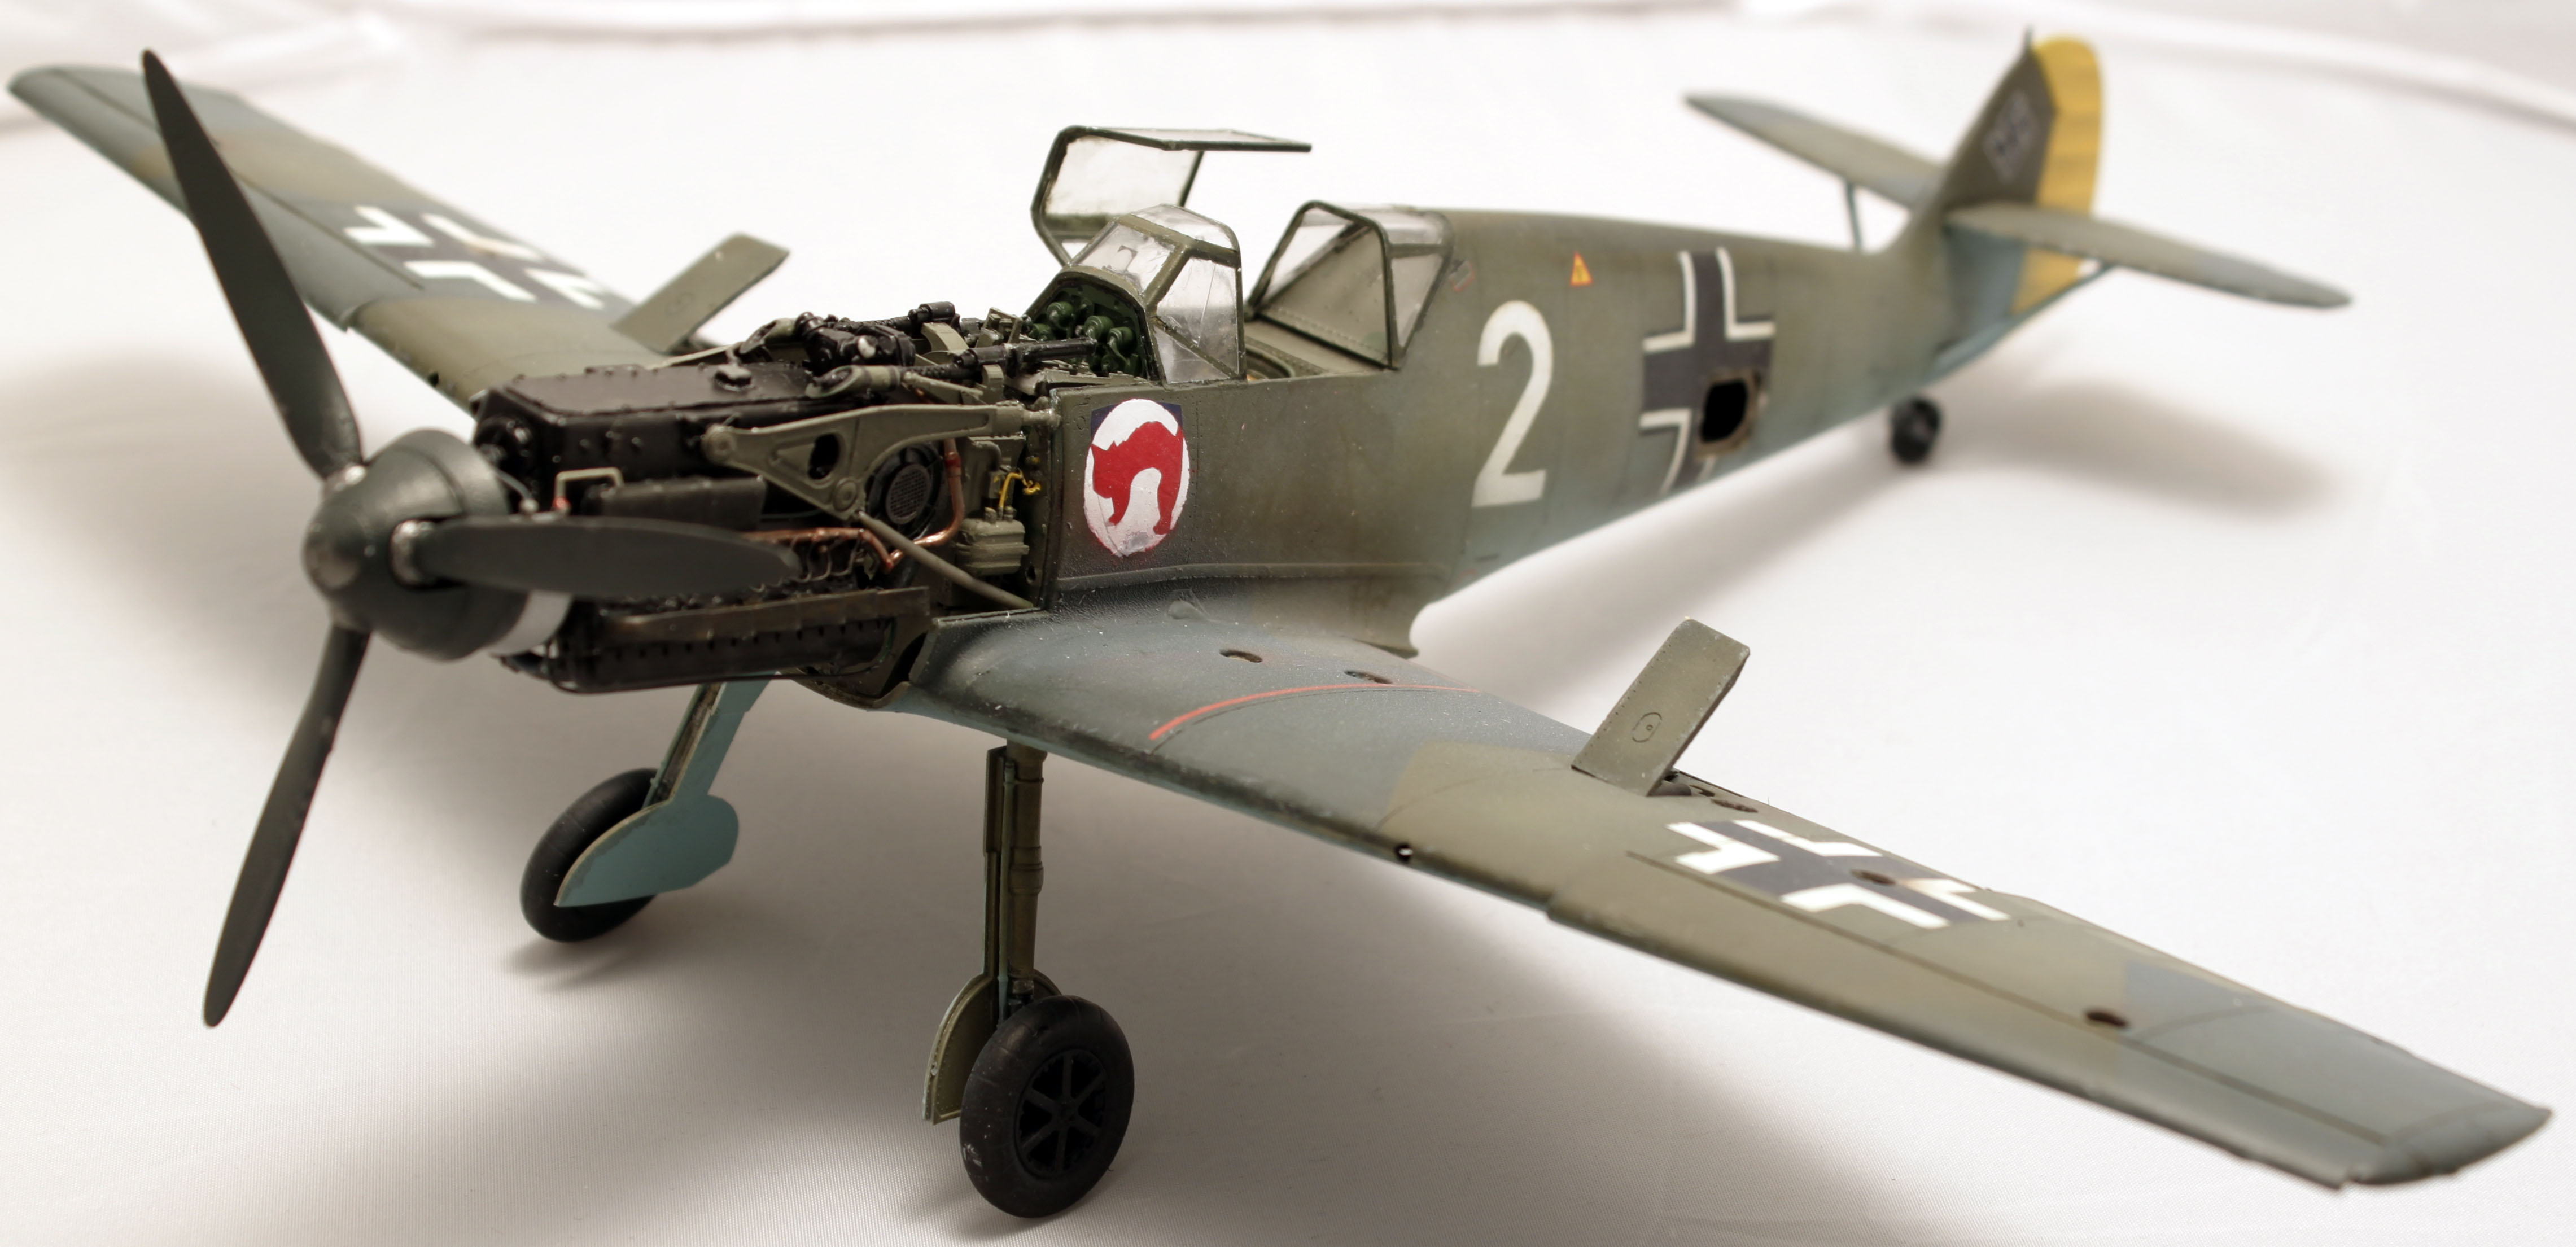 Me Bf 109 E1  [ Eduard 1/32 ] - Page 5 Dqnpw9